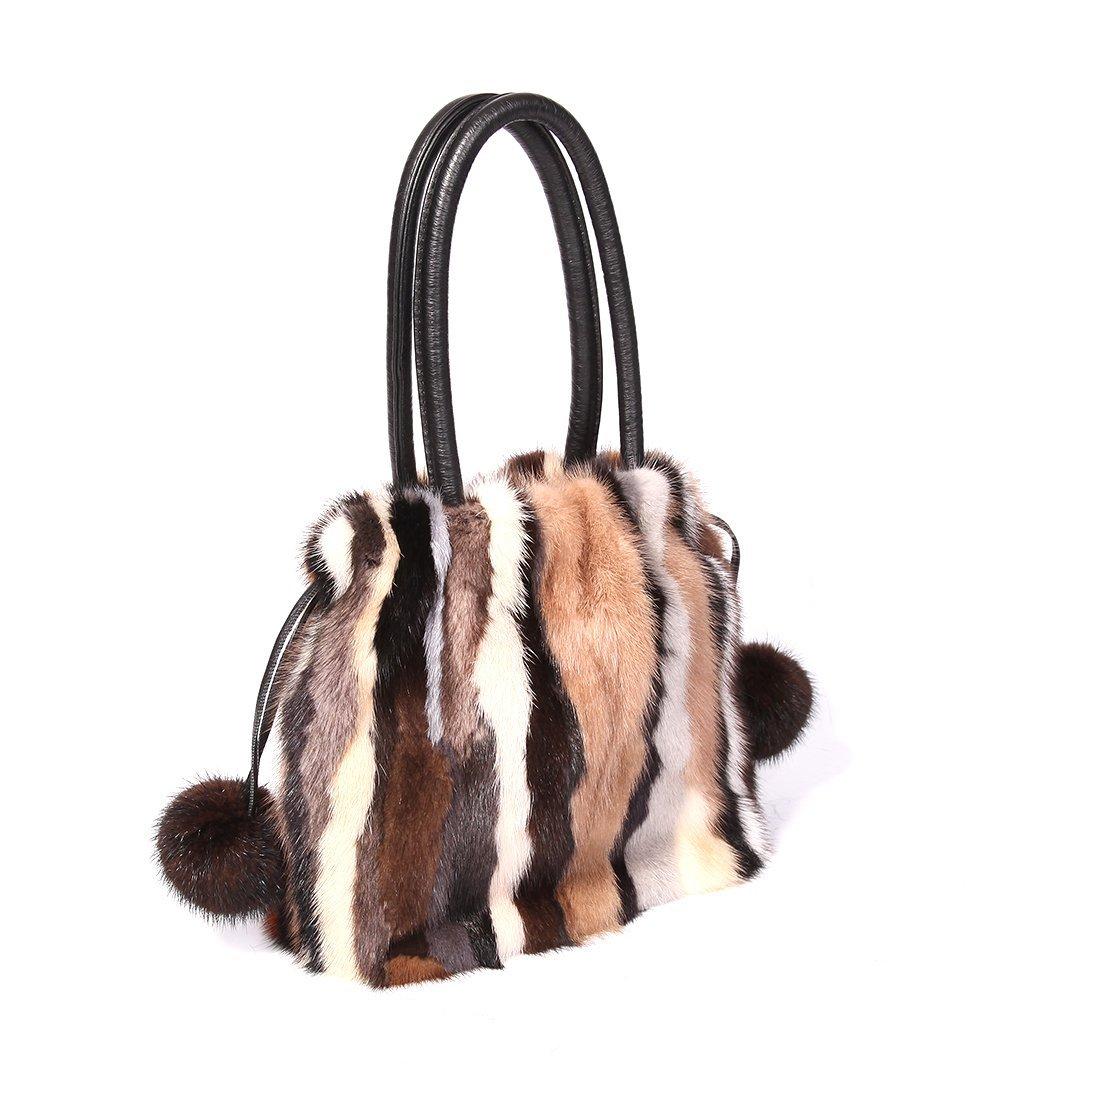 URSFUR Women Shoulder Handbag Mink Fur Clutch Tote Hobo Bag Purse with Fur Ball